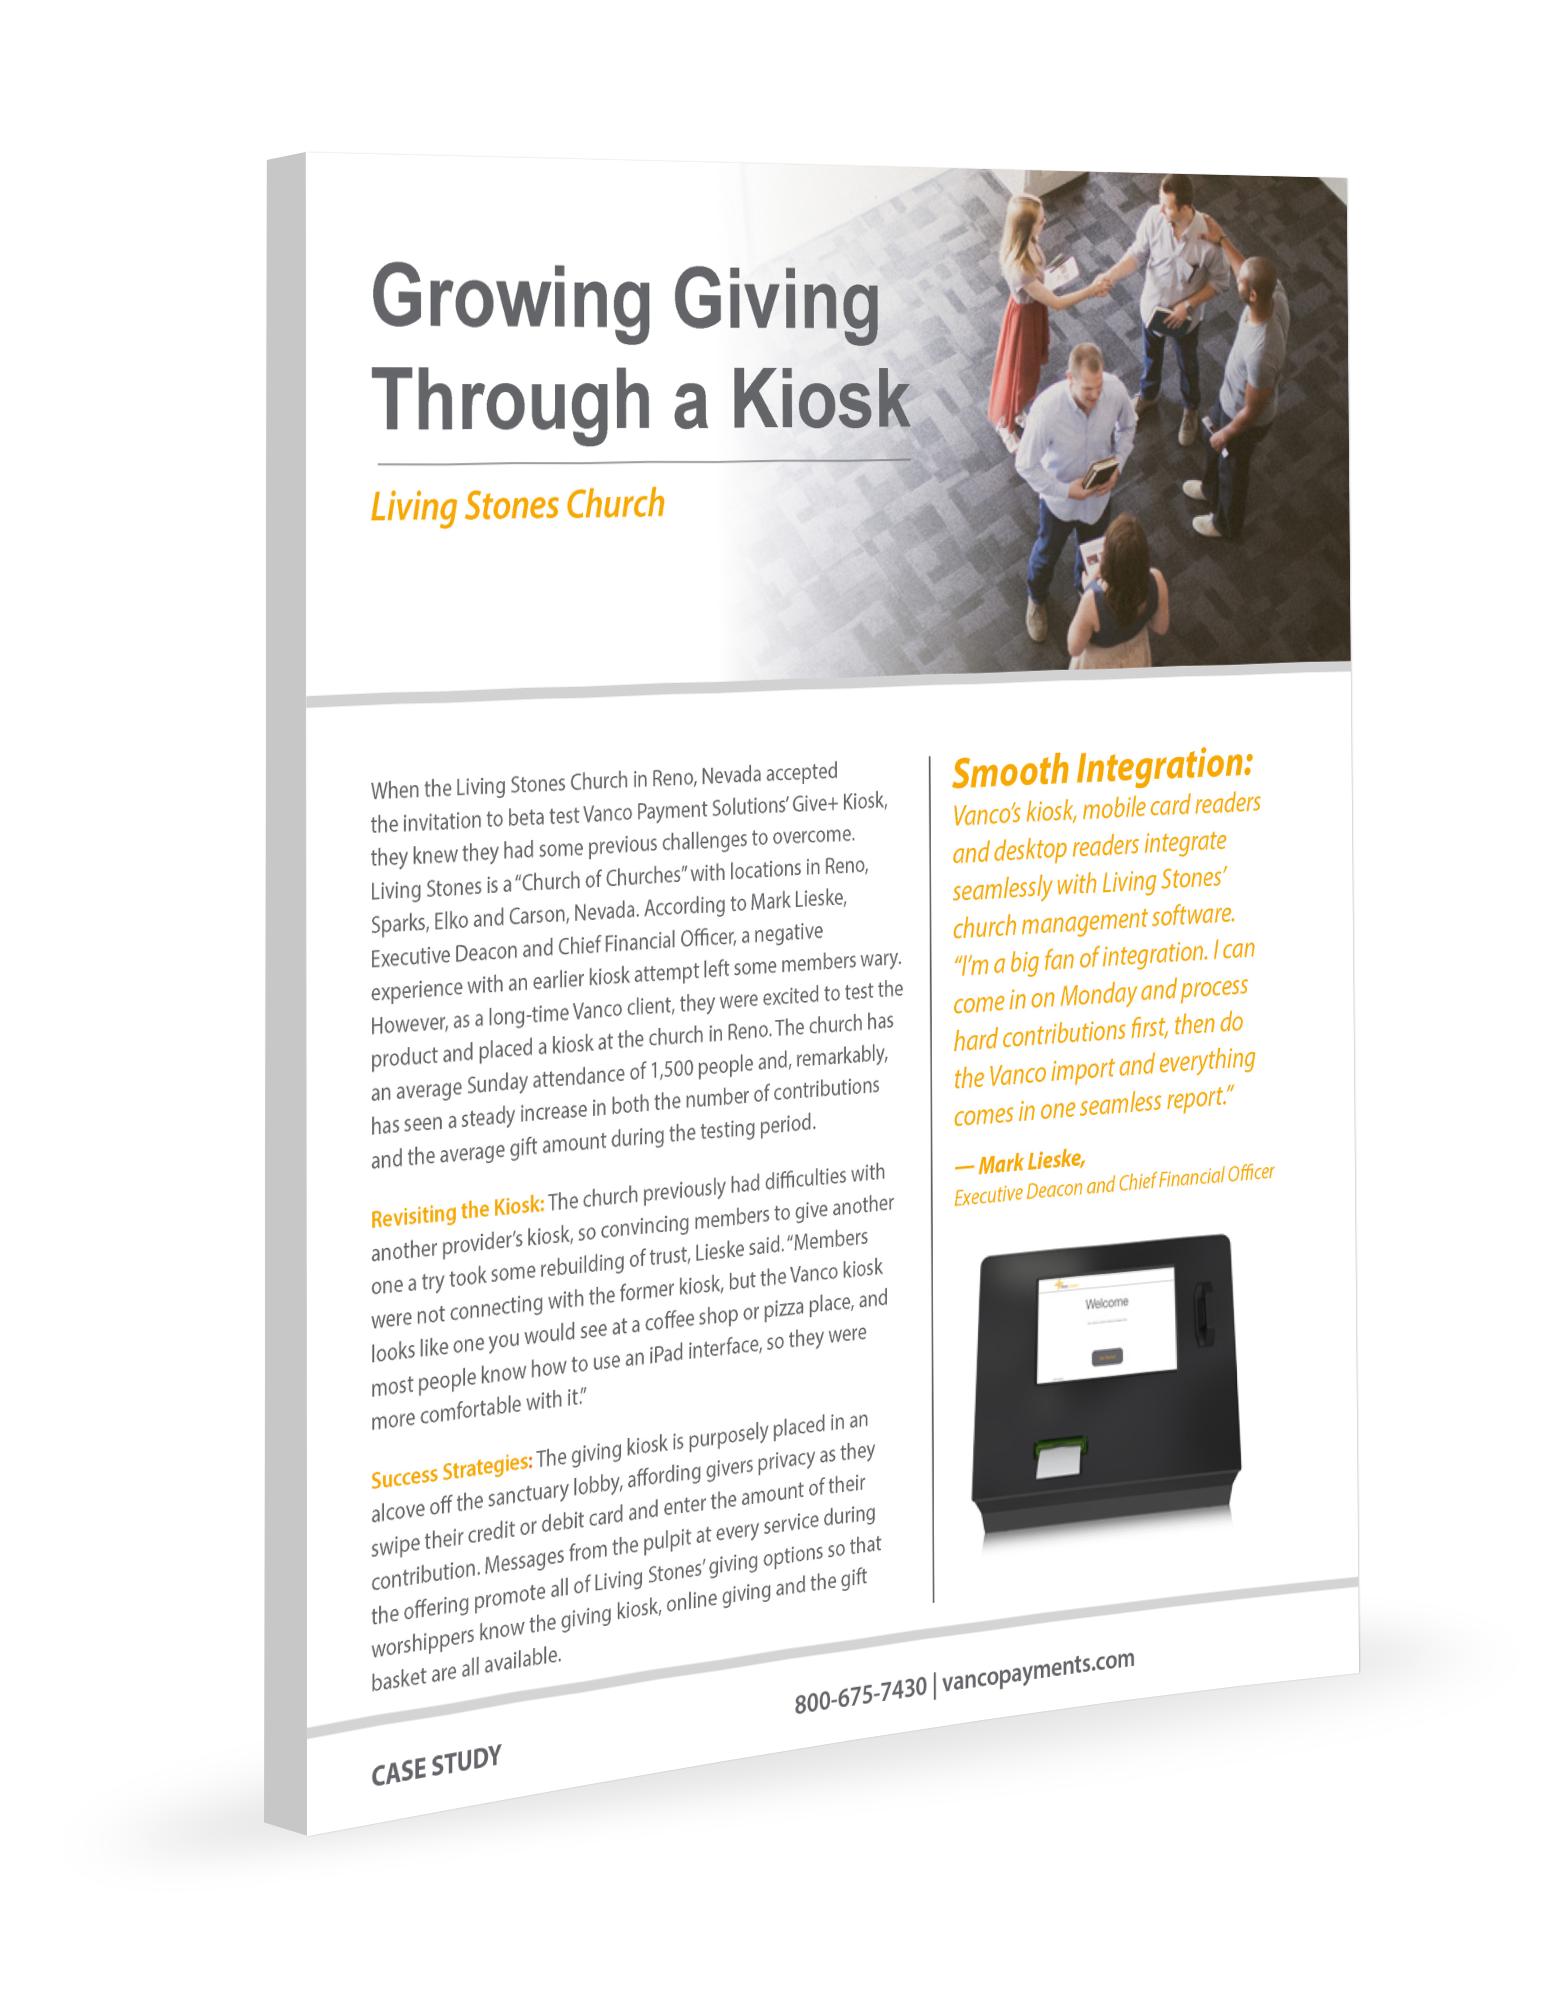 Growing Giving Through Kiosk